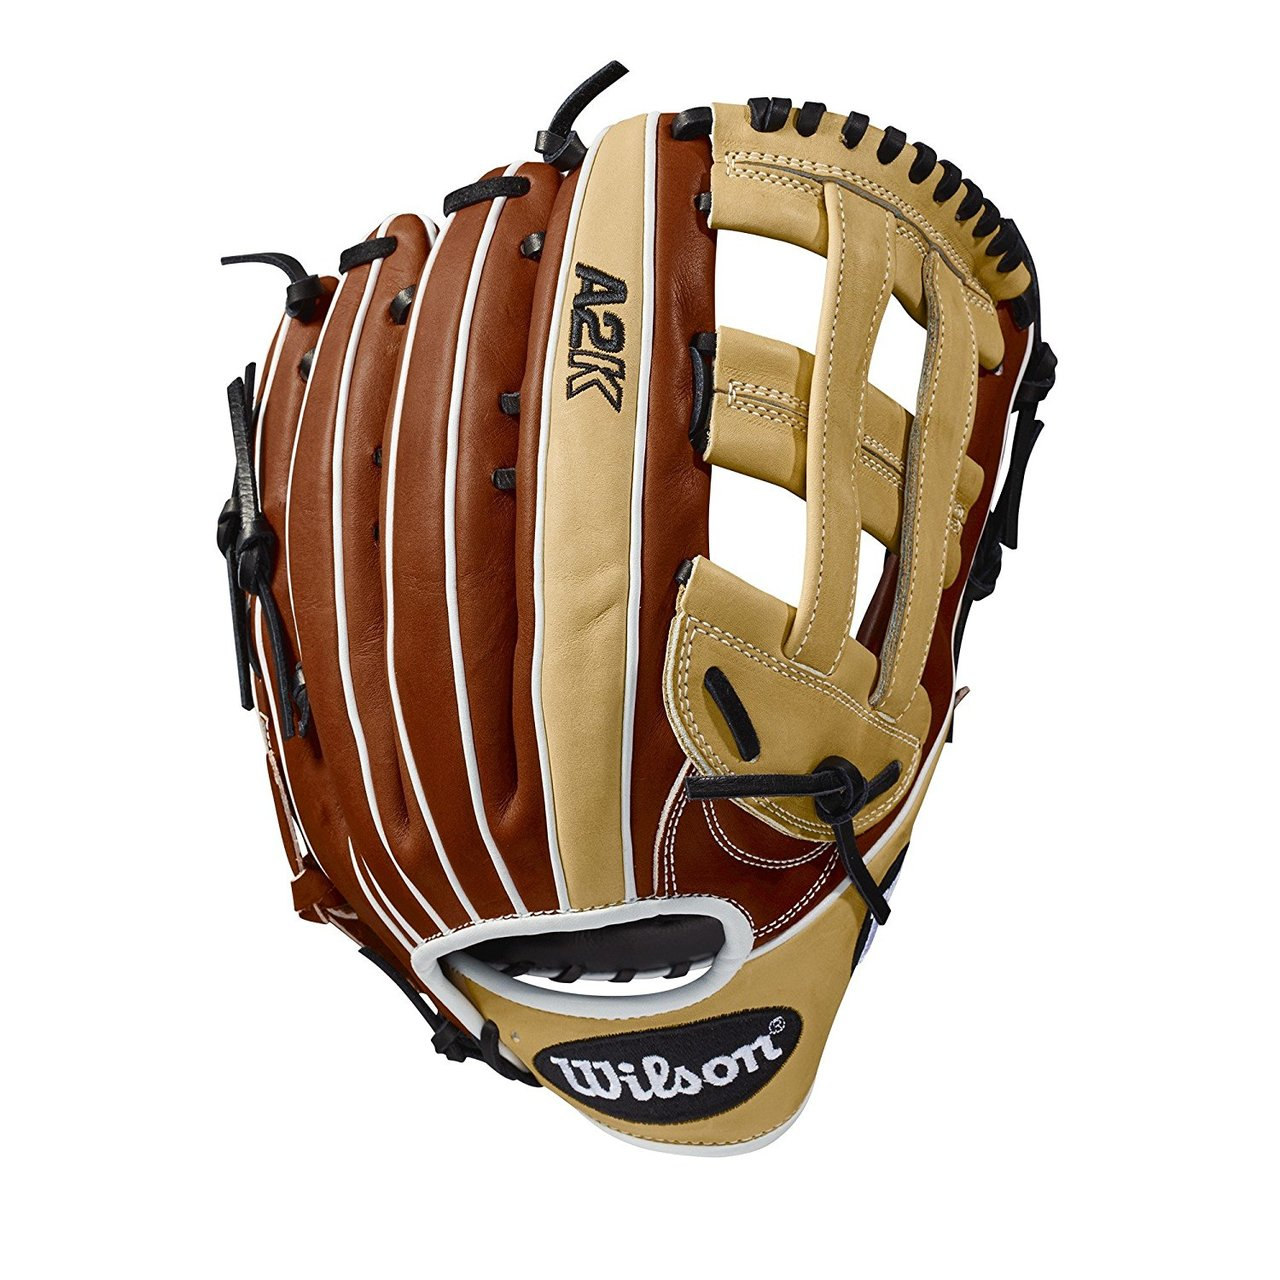 wilson-2018-a2k-1799-outfield-baseball-glove-right-hand-throw-12-75-inch WTA2KRB181799-RightHandThrow Wilson 887768592042